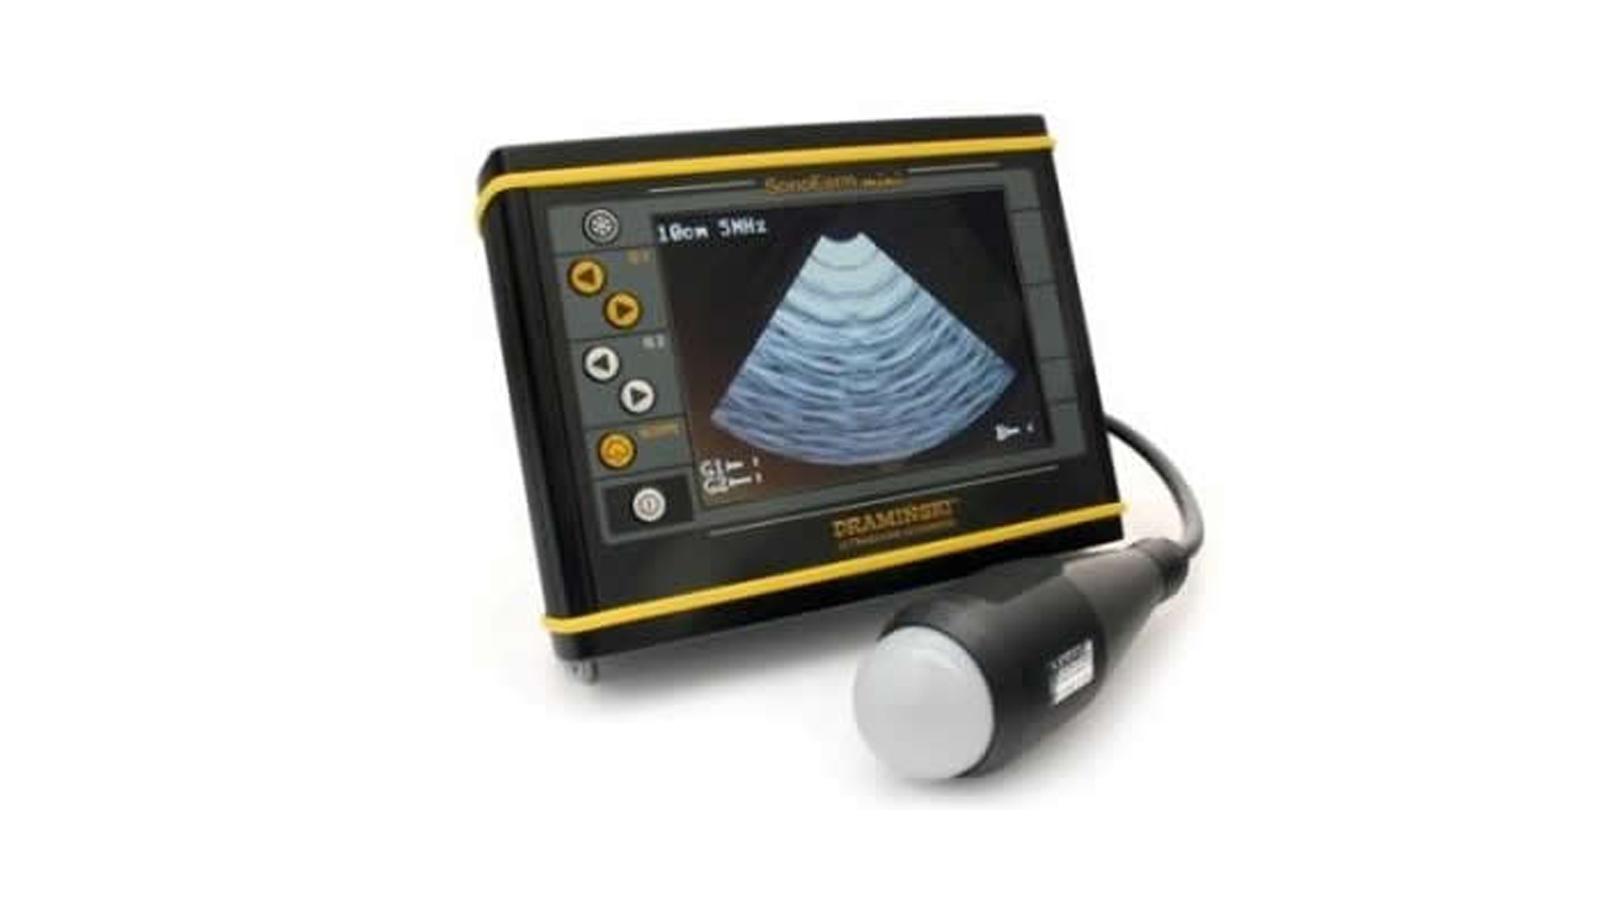 DRAMIŃSKI SonoFarm Mini Ultrason Cihazı || Merlab Laboratuvar Ekipmanları